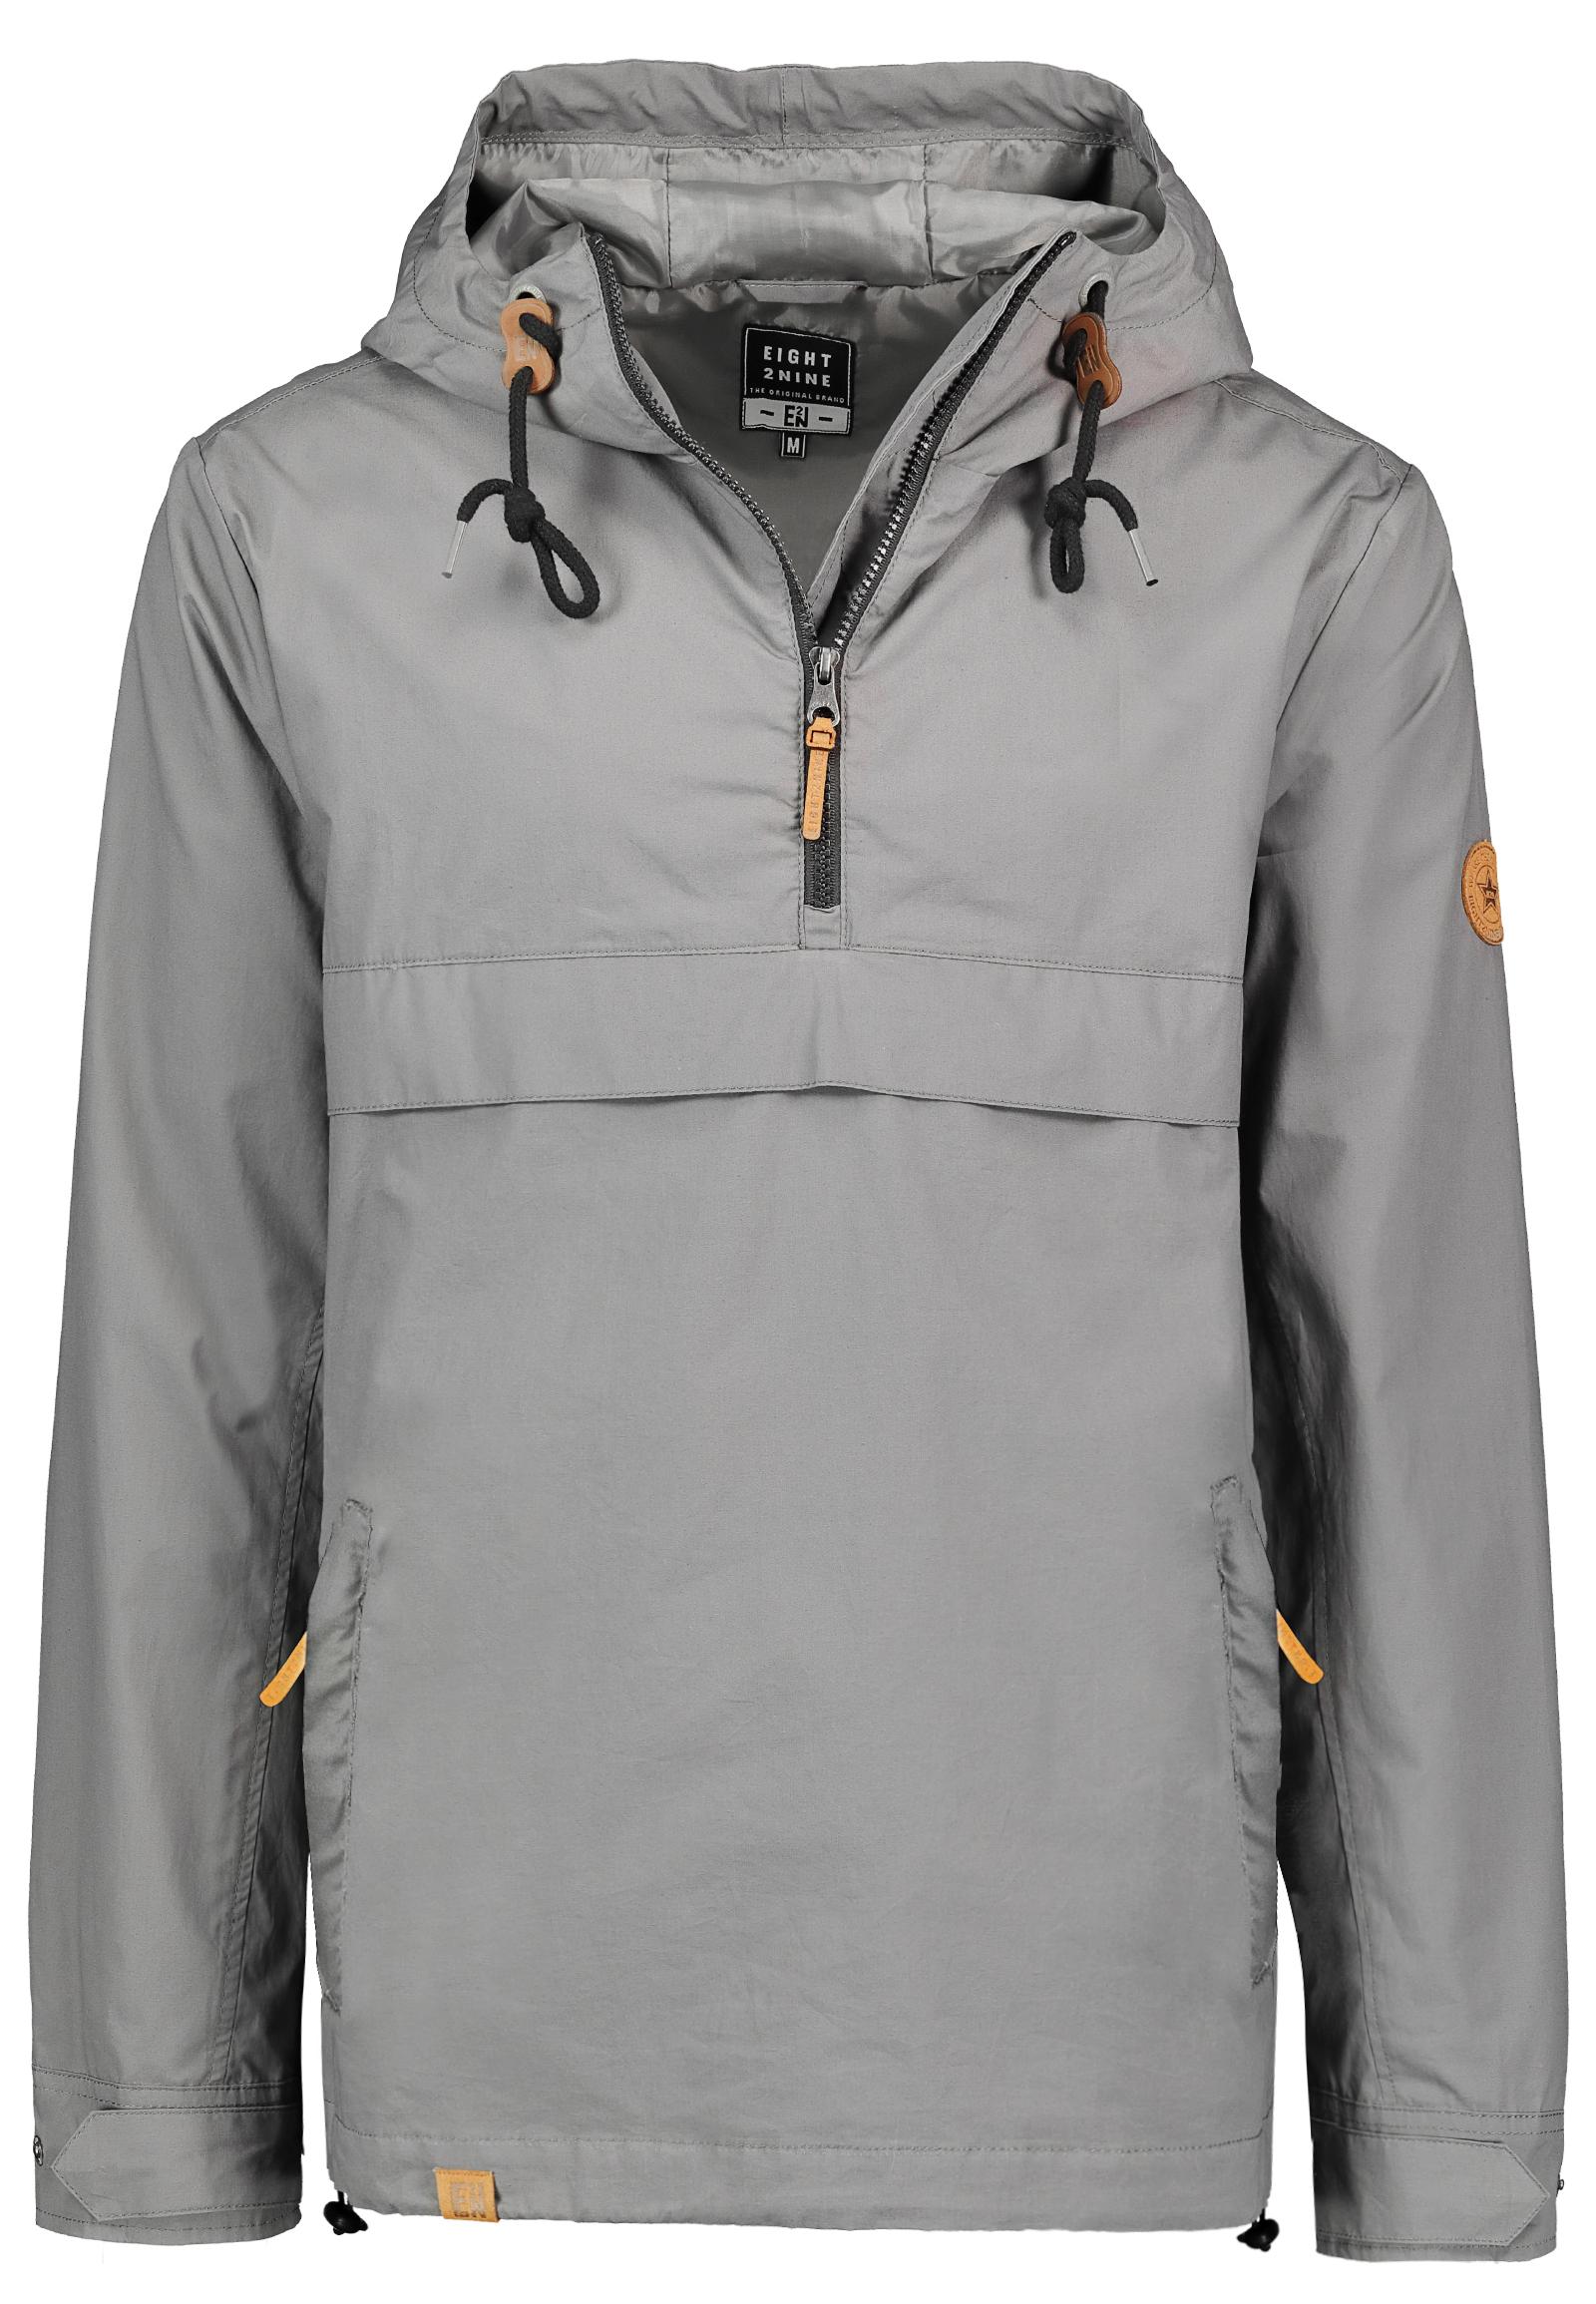 Details zu EIGHT2NINE Herren Schlupf Jacke mit Kapuze Half Zip Windbreaker Übergangsjacke